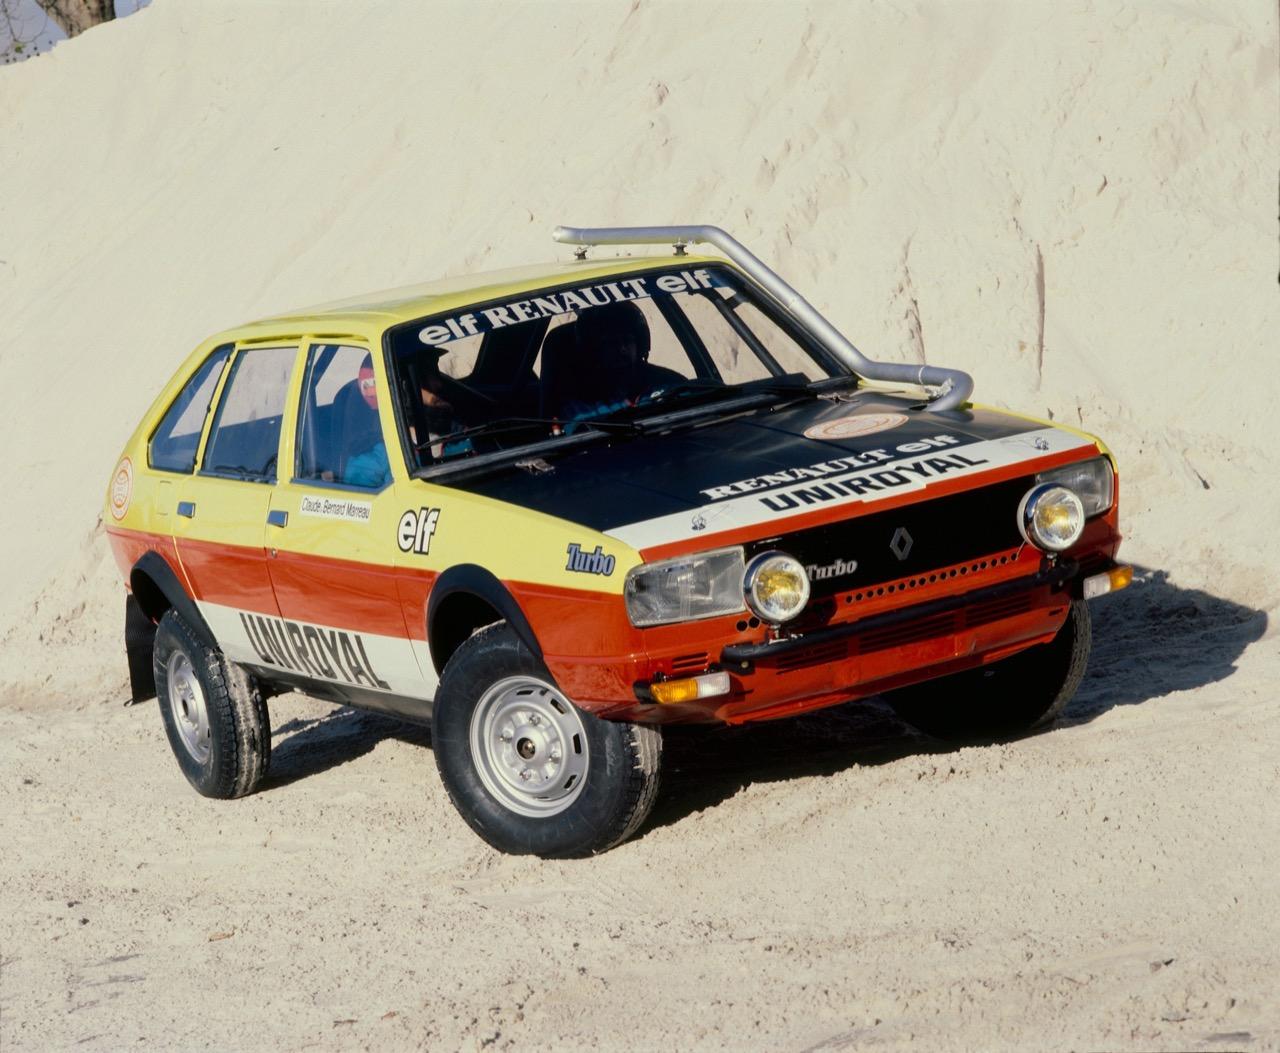 renault-sport-turbo-40th-anniversary-models-race-street-1979-2019-001.jpg